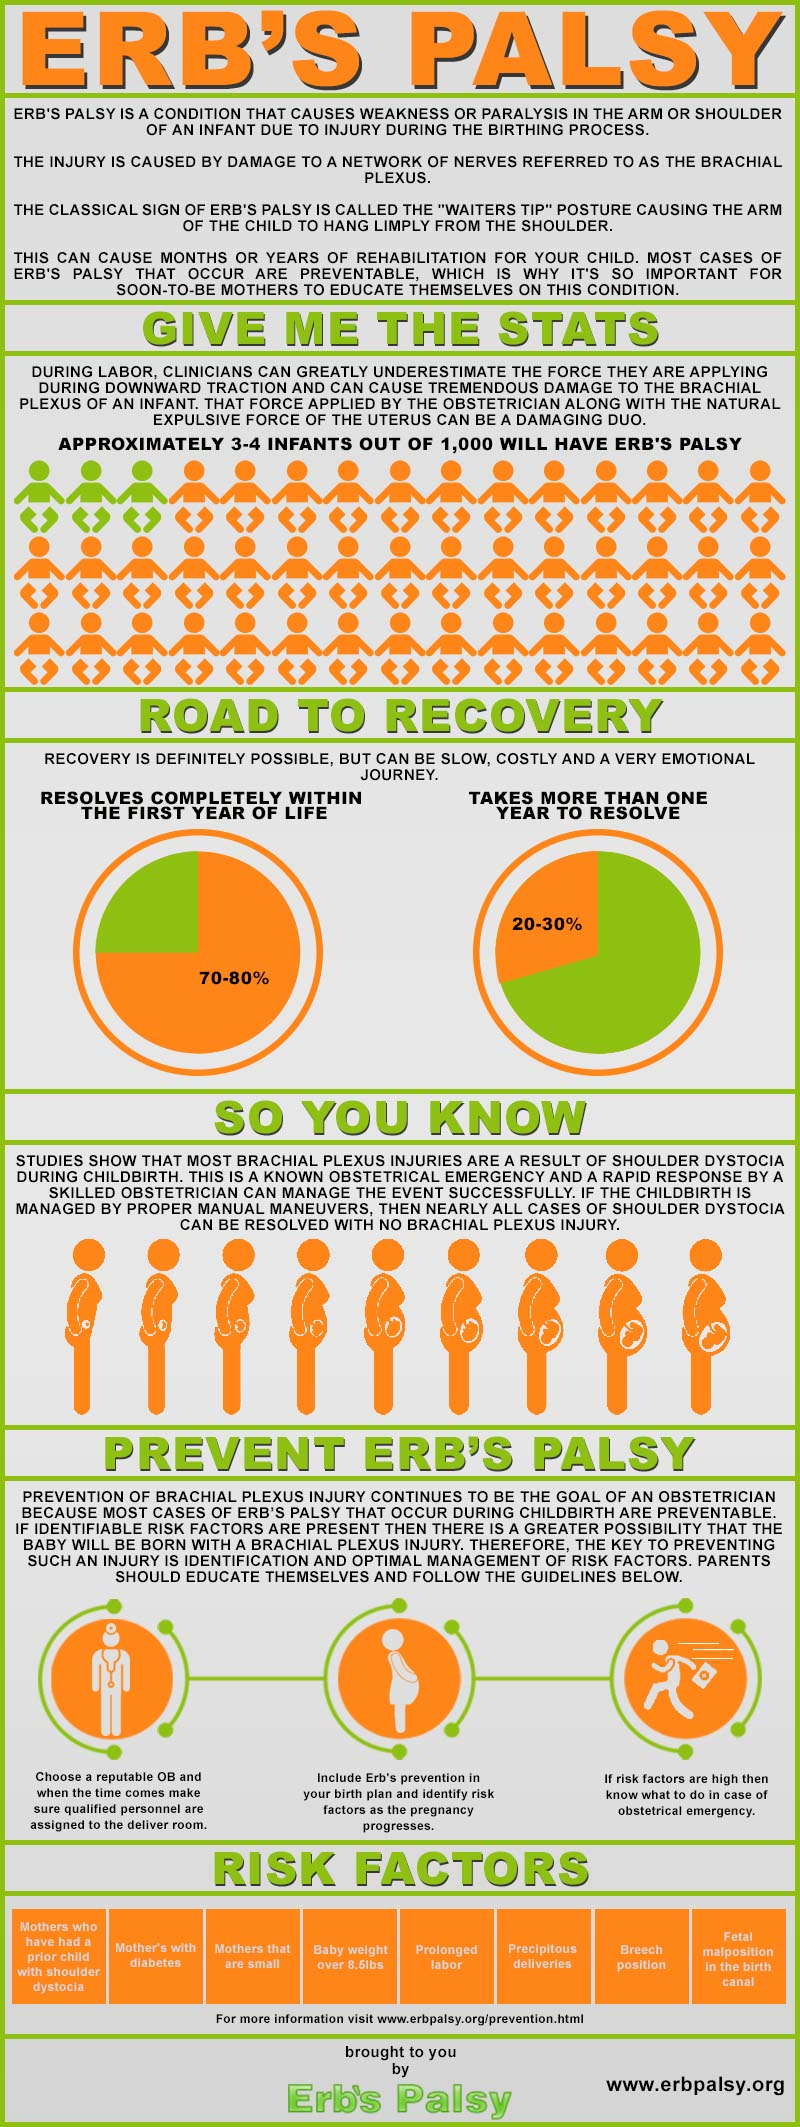 Erb's Palsy Awareness-Infographic